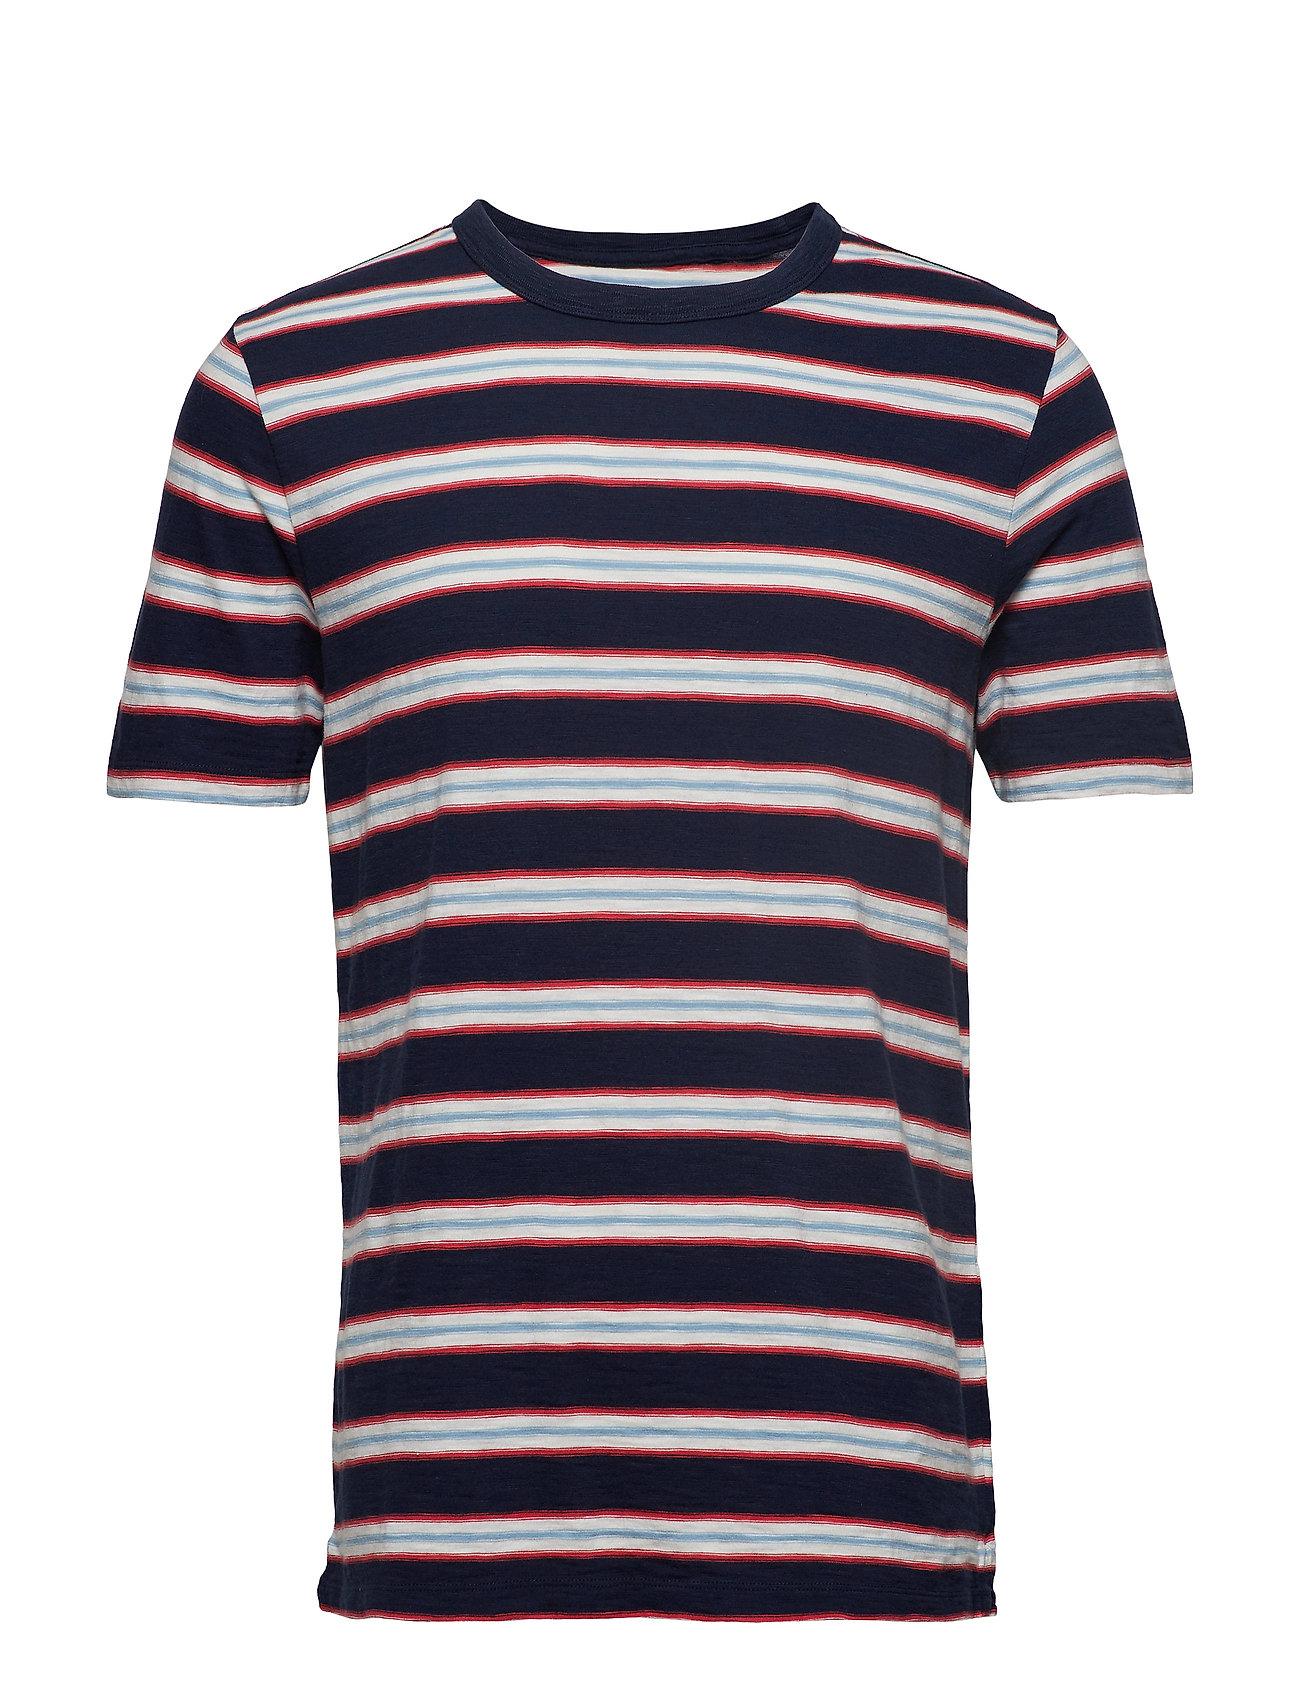 GAP Vintage Slub Jersey Stripe Crewneck T-Shirt - TAP NAVY STRIPE